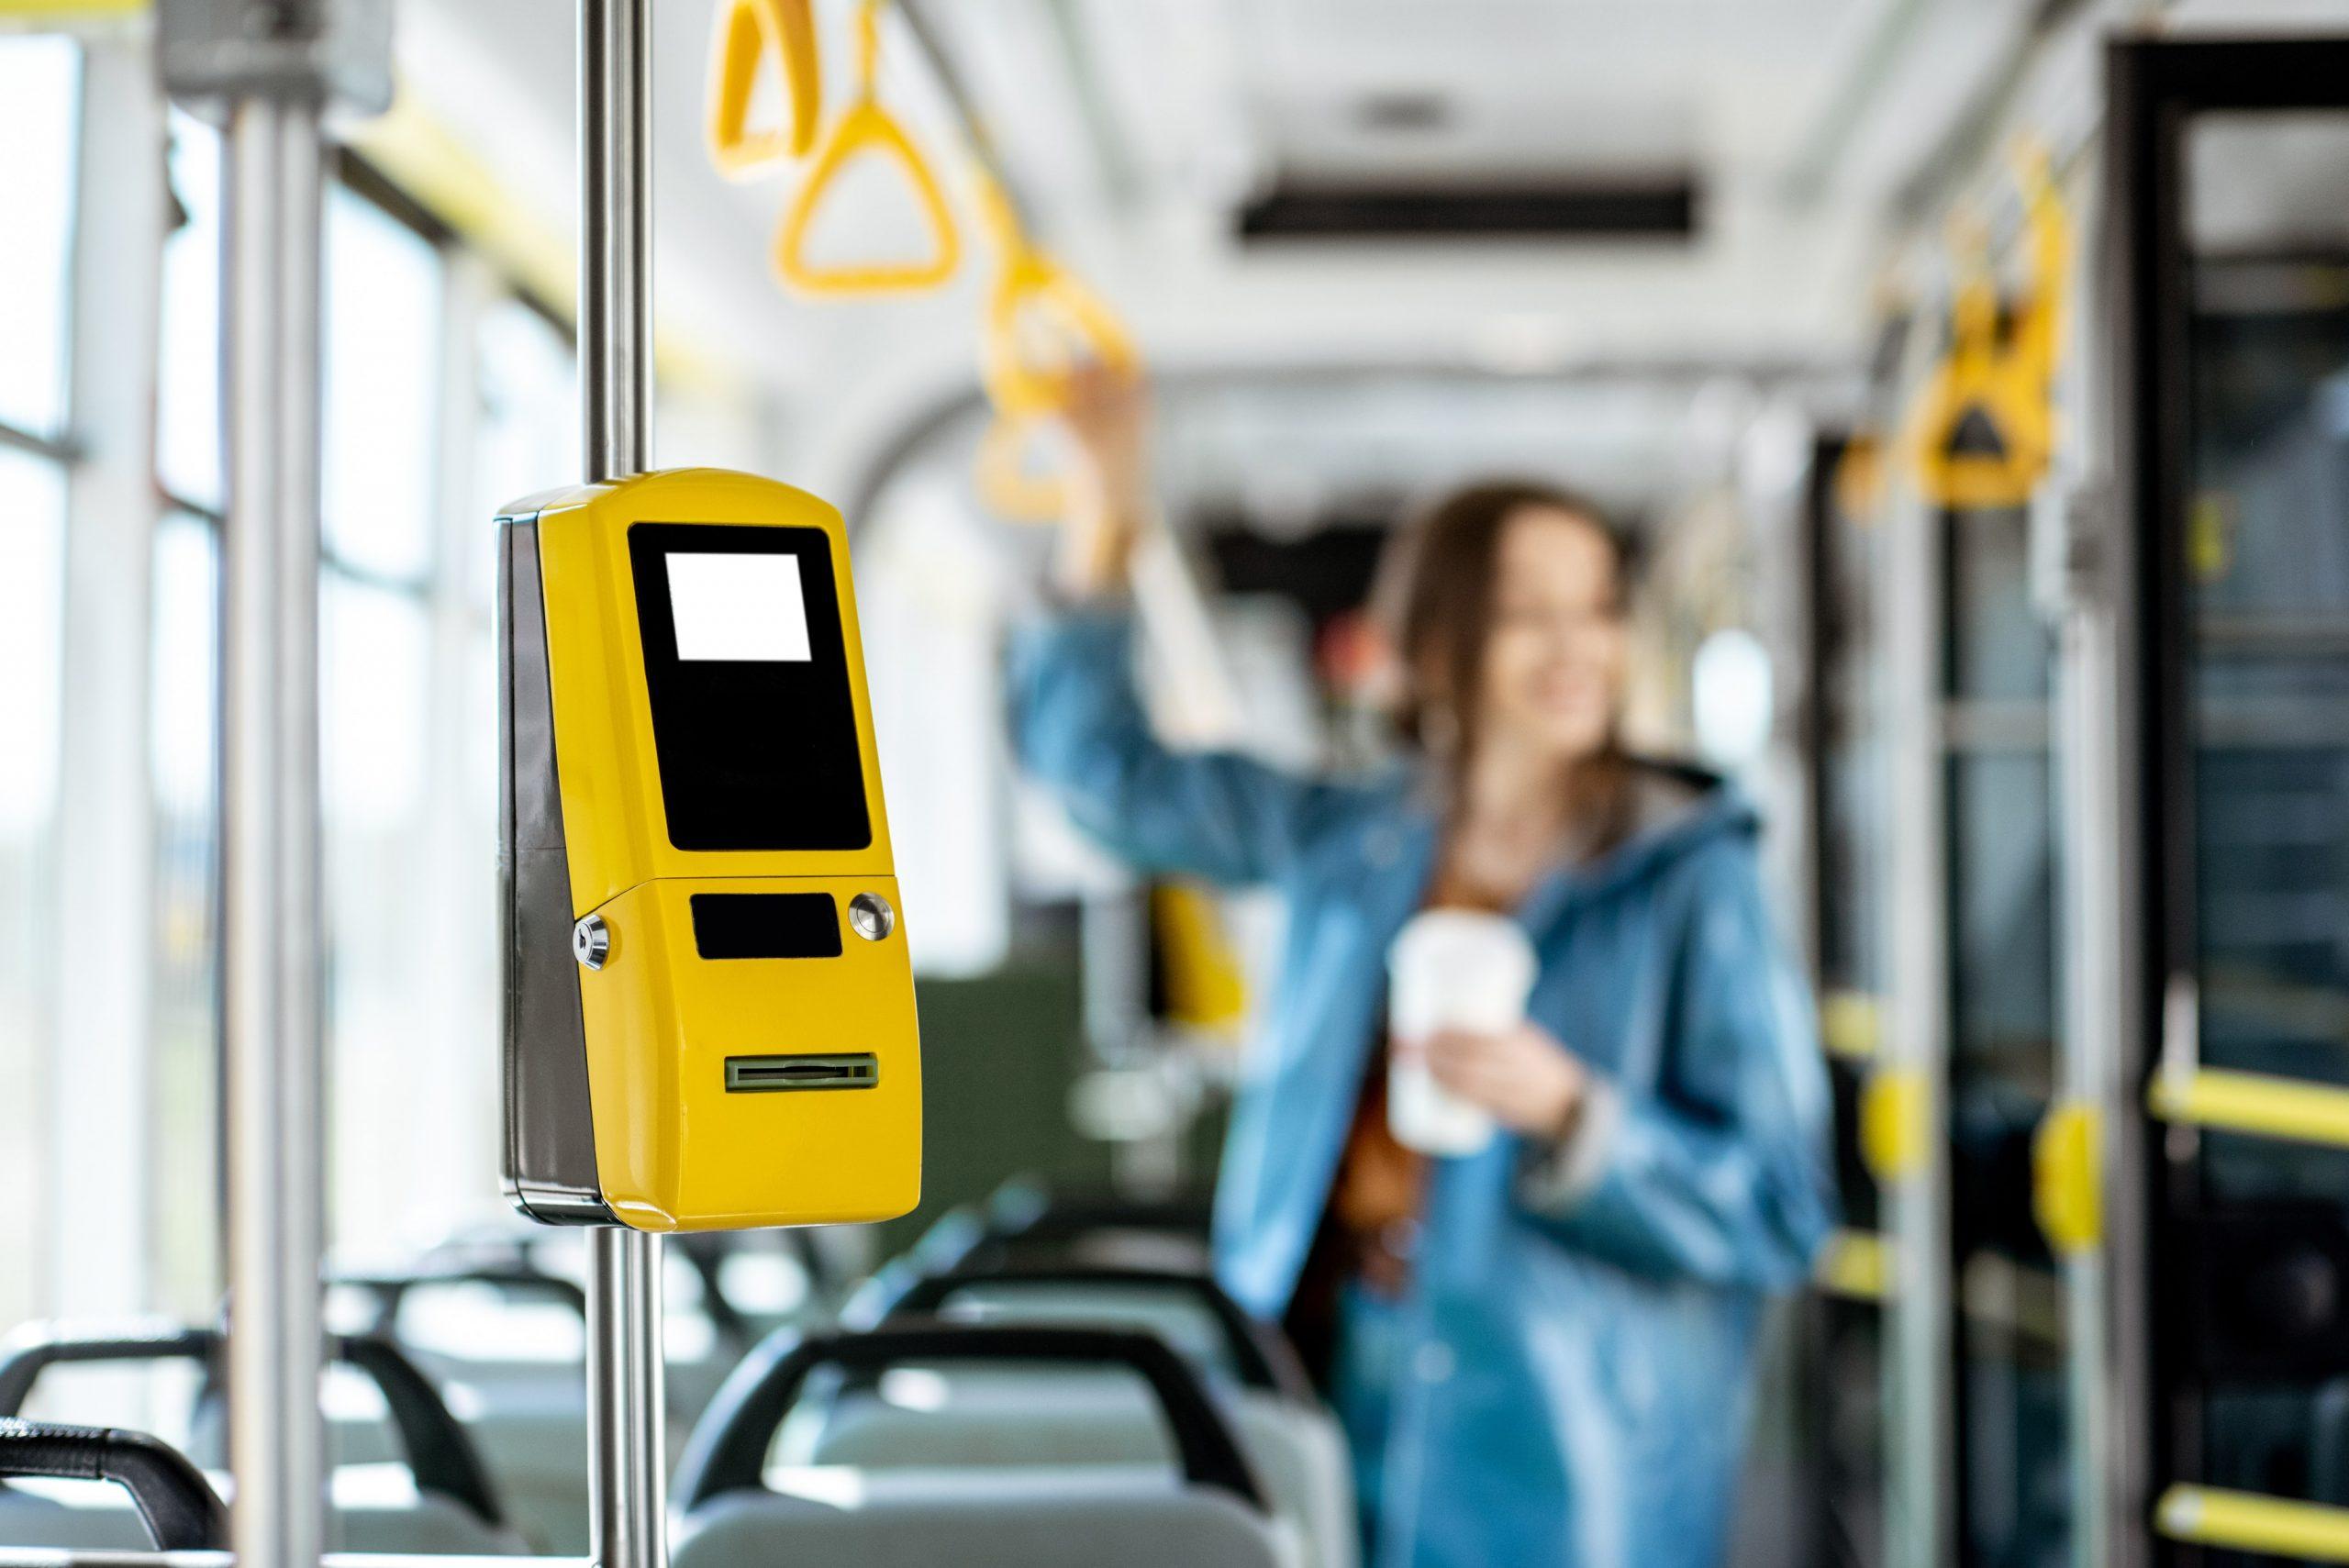 Bus Ticketing System